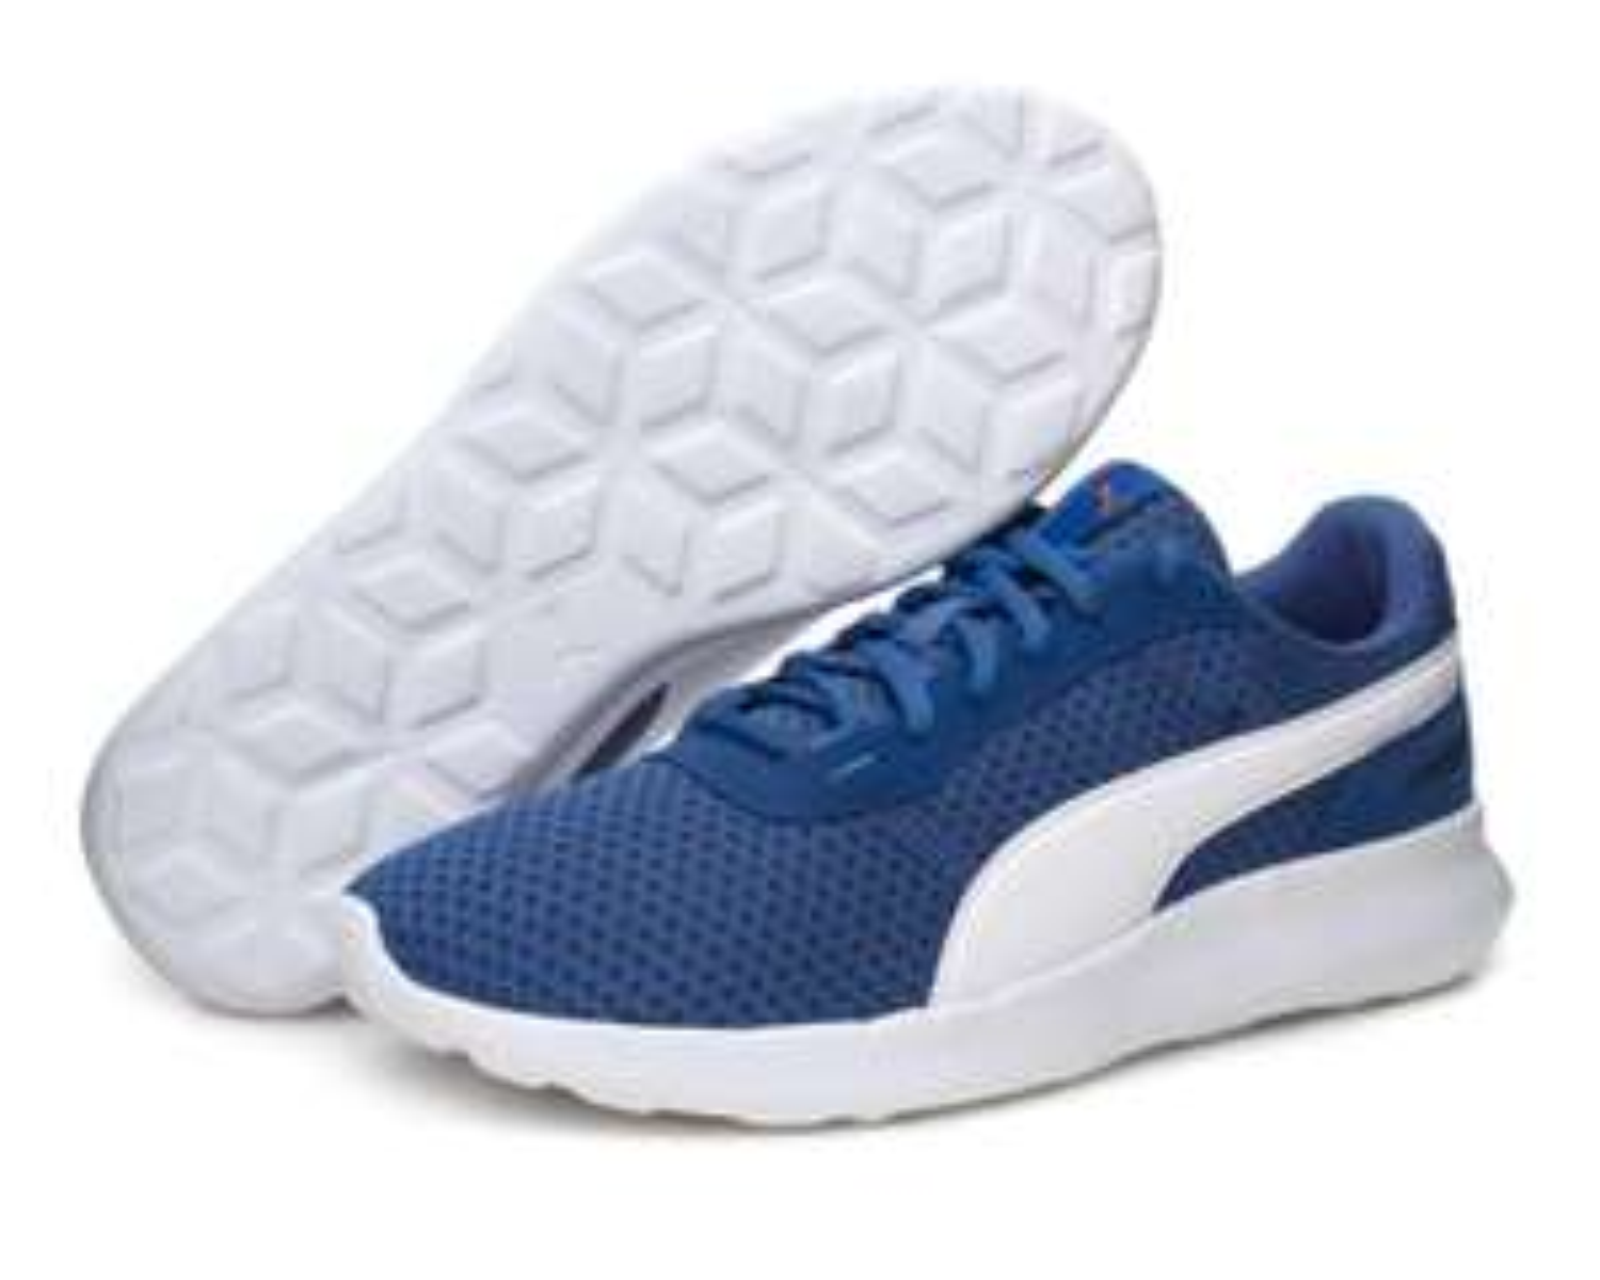 Coppel: Tenis Puma ST Activate Jr color Azul